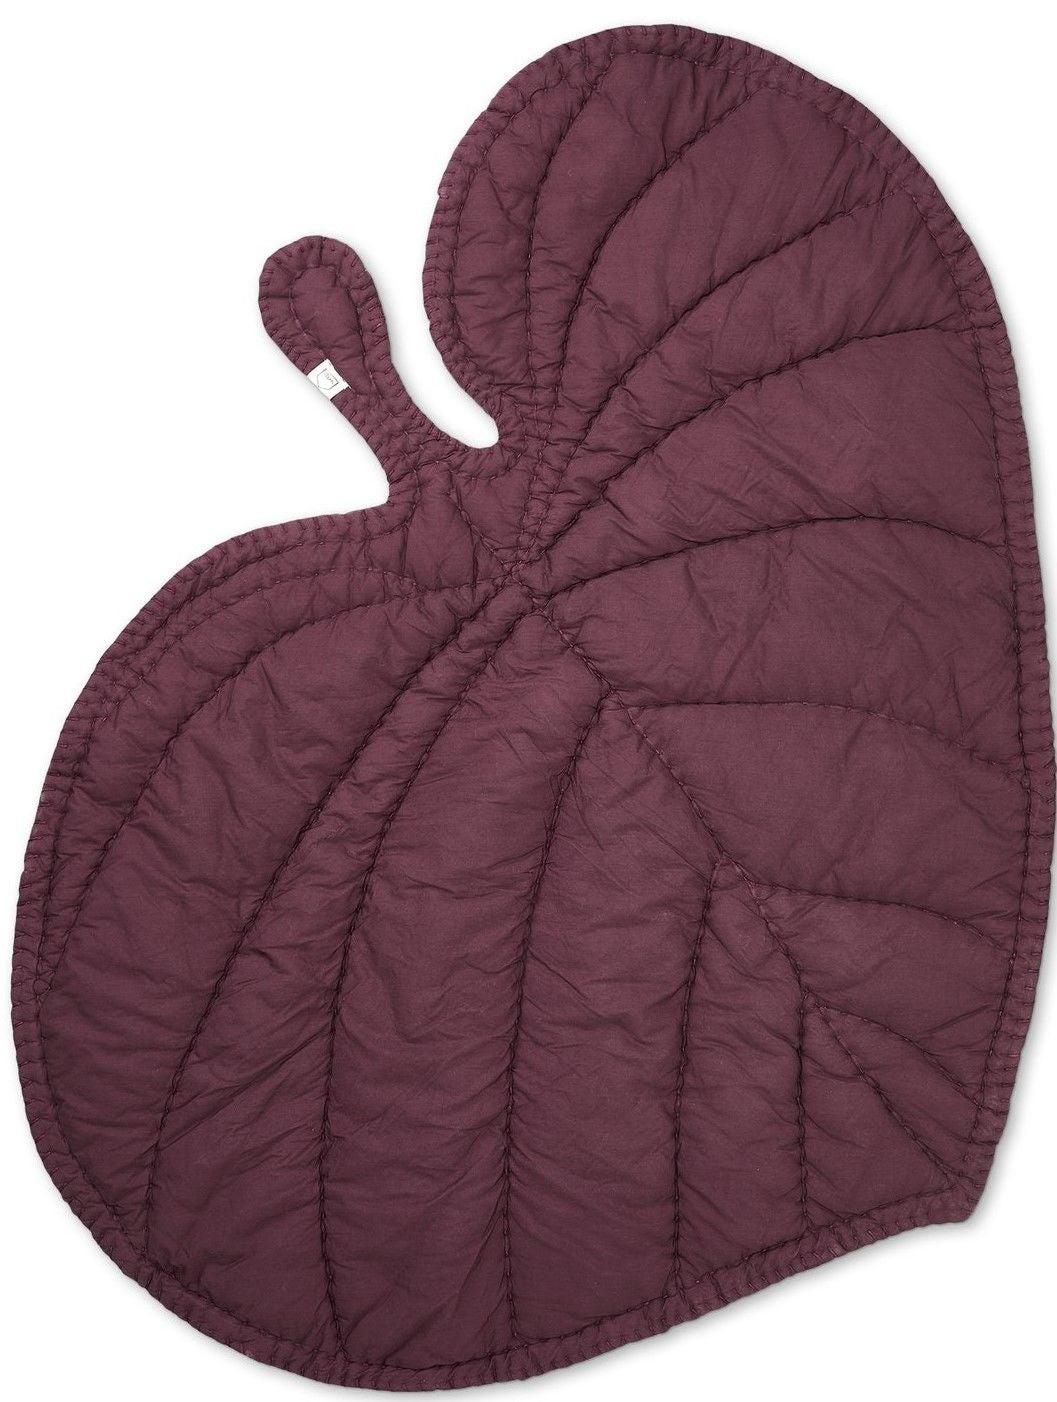 Nofred Leaf Viltti, Burgundy